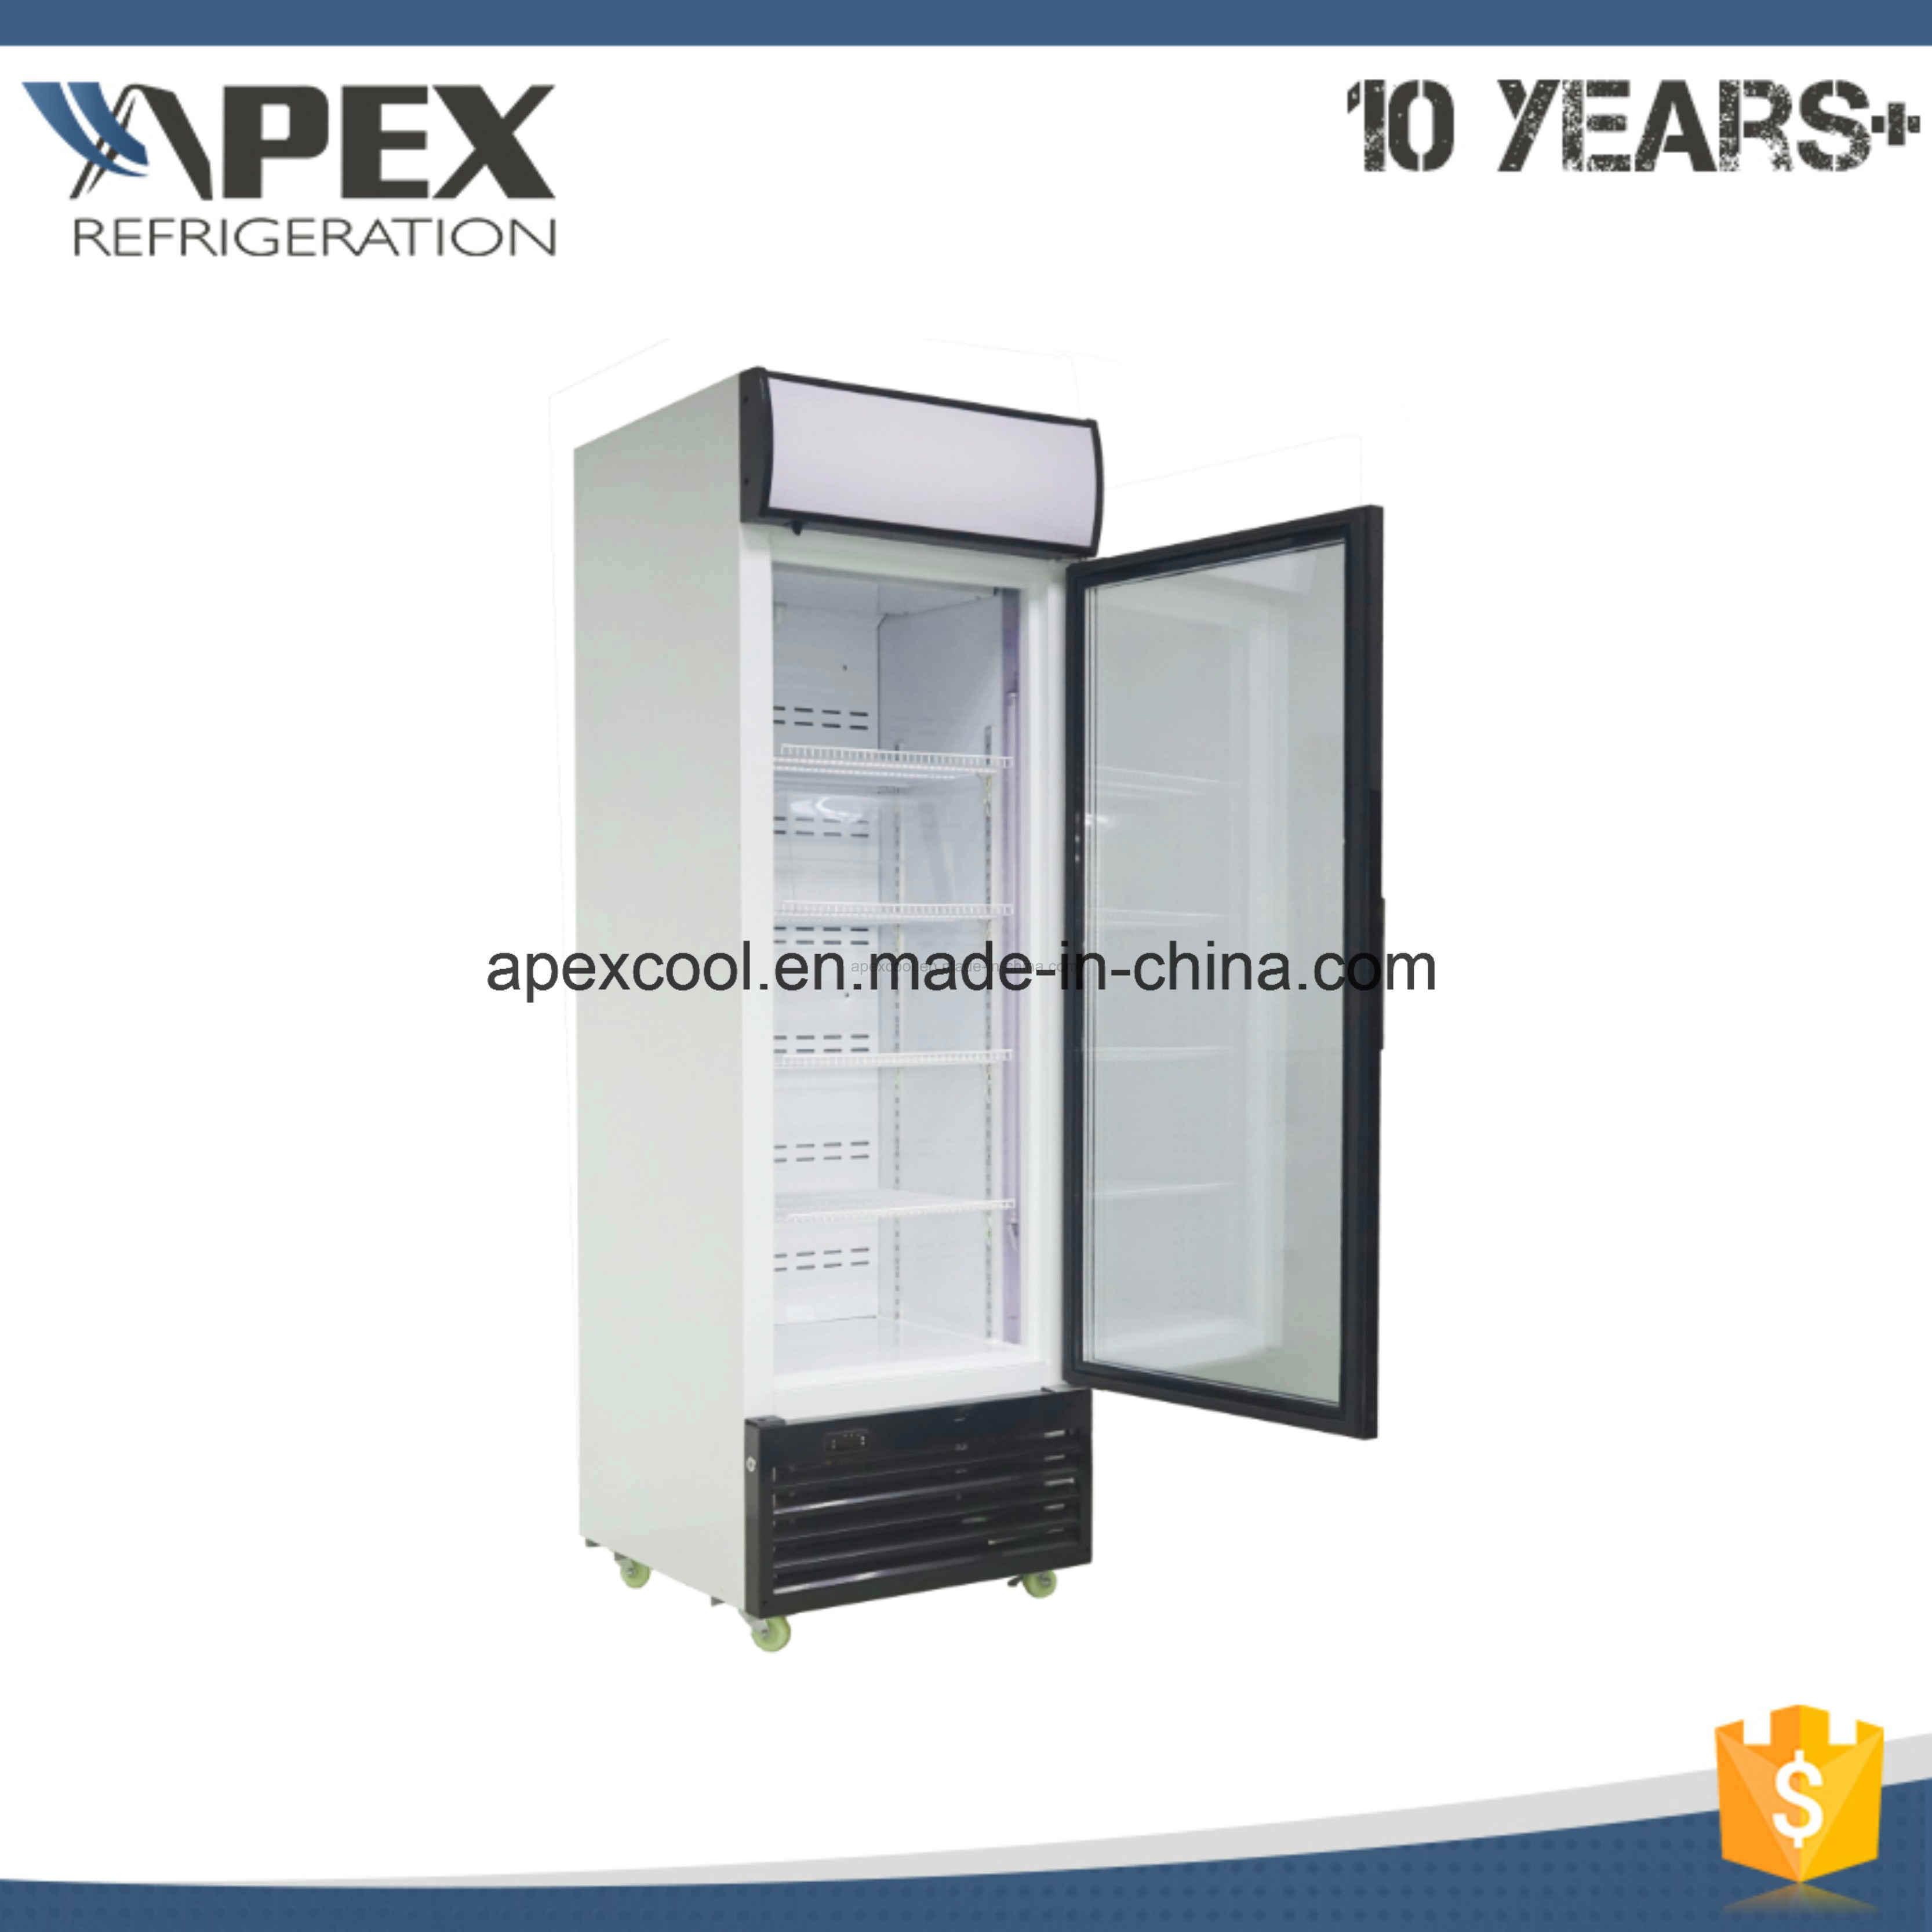 Single Door Upright Ice Creaml display Freezer